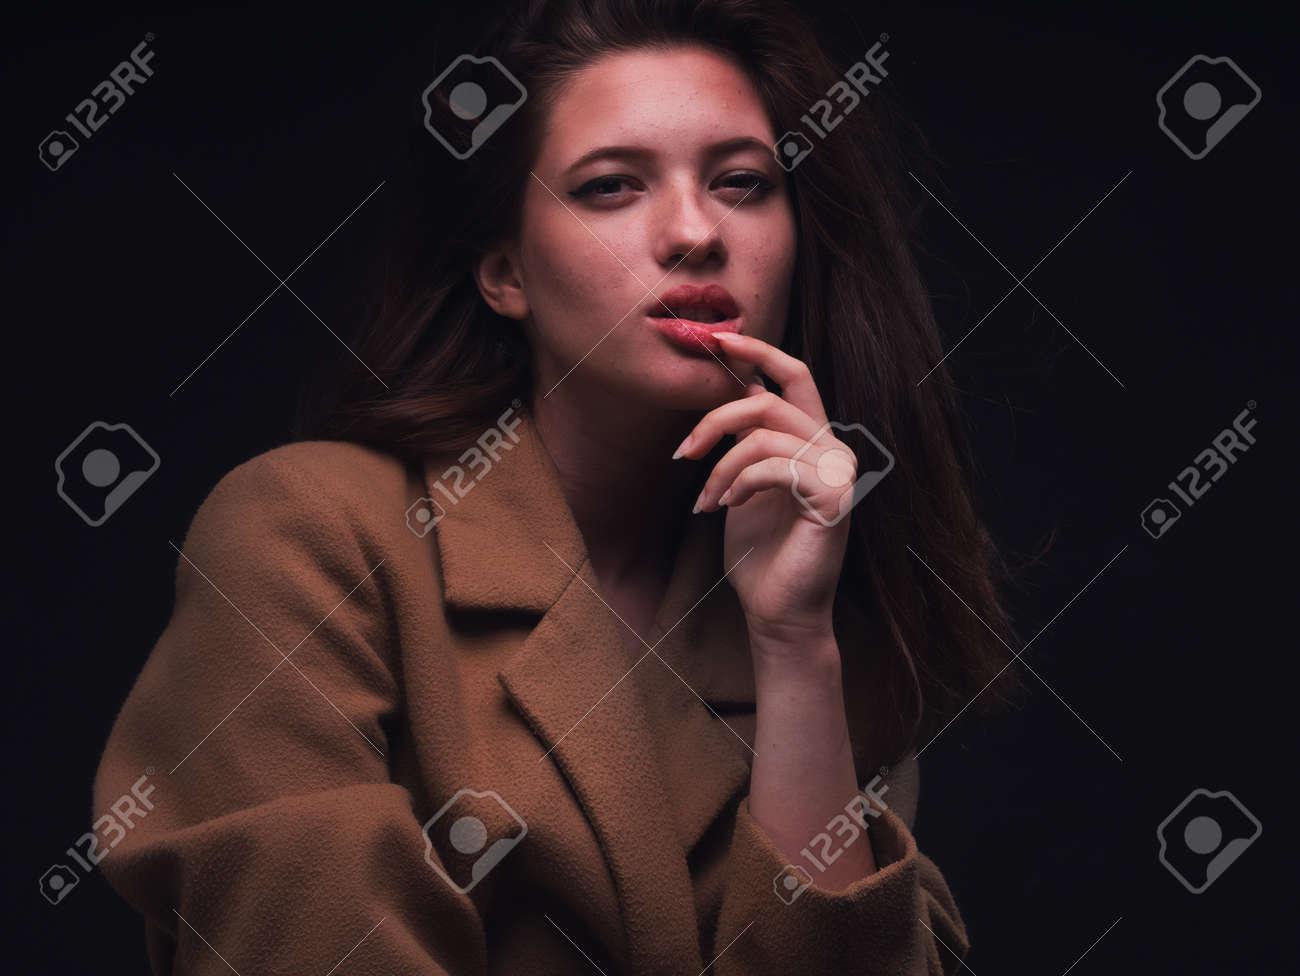 high key. Conceptual portrait with plastic sheets. One young woman strugling with plastic sheets. - 164118911